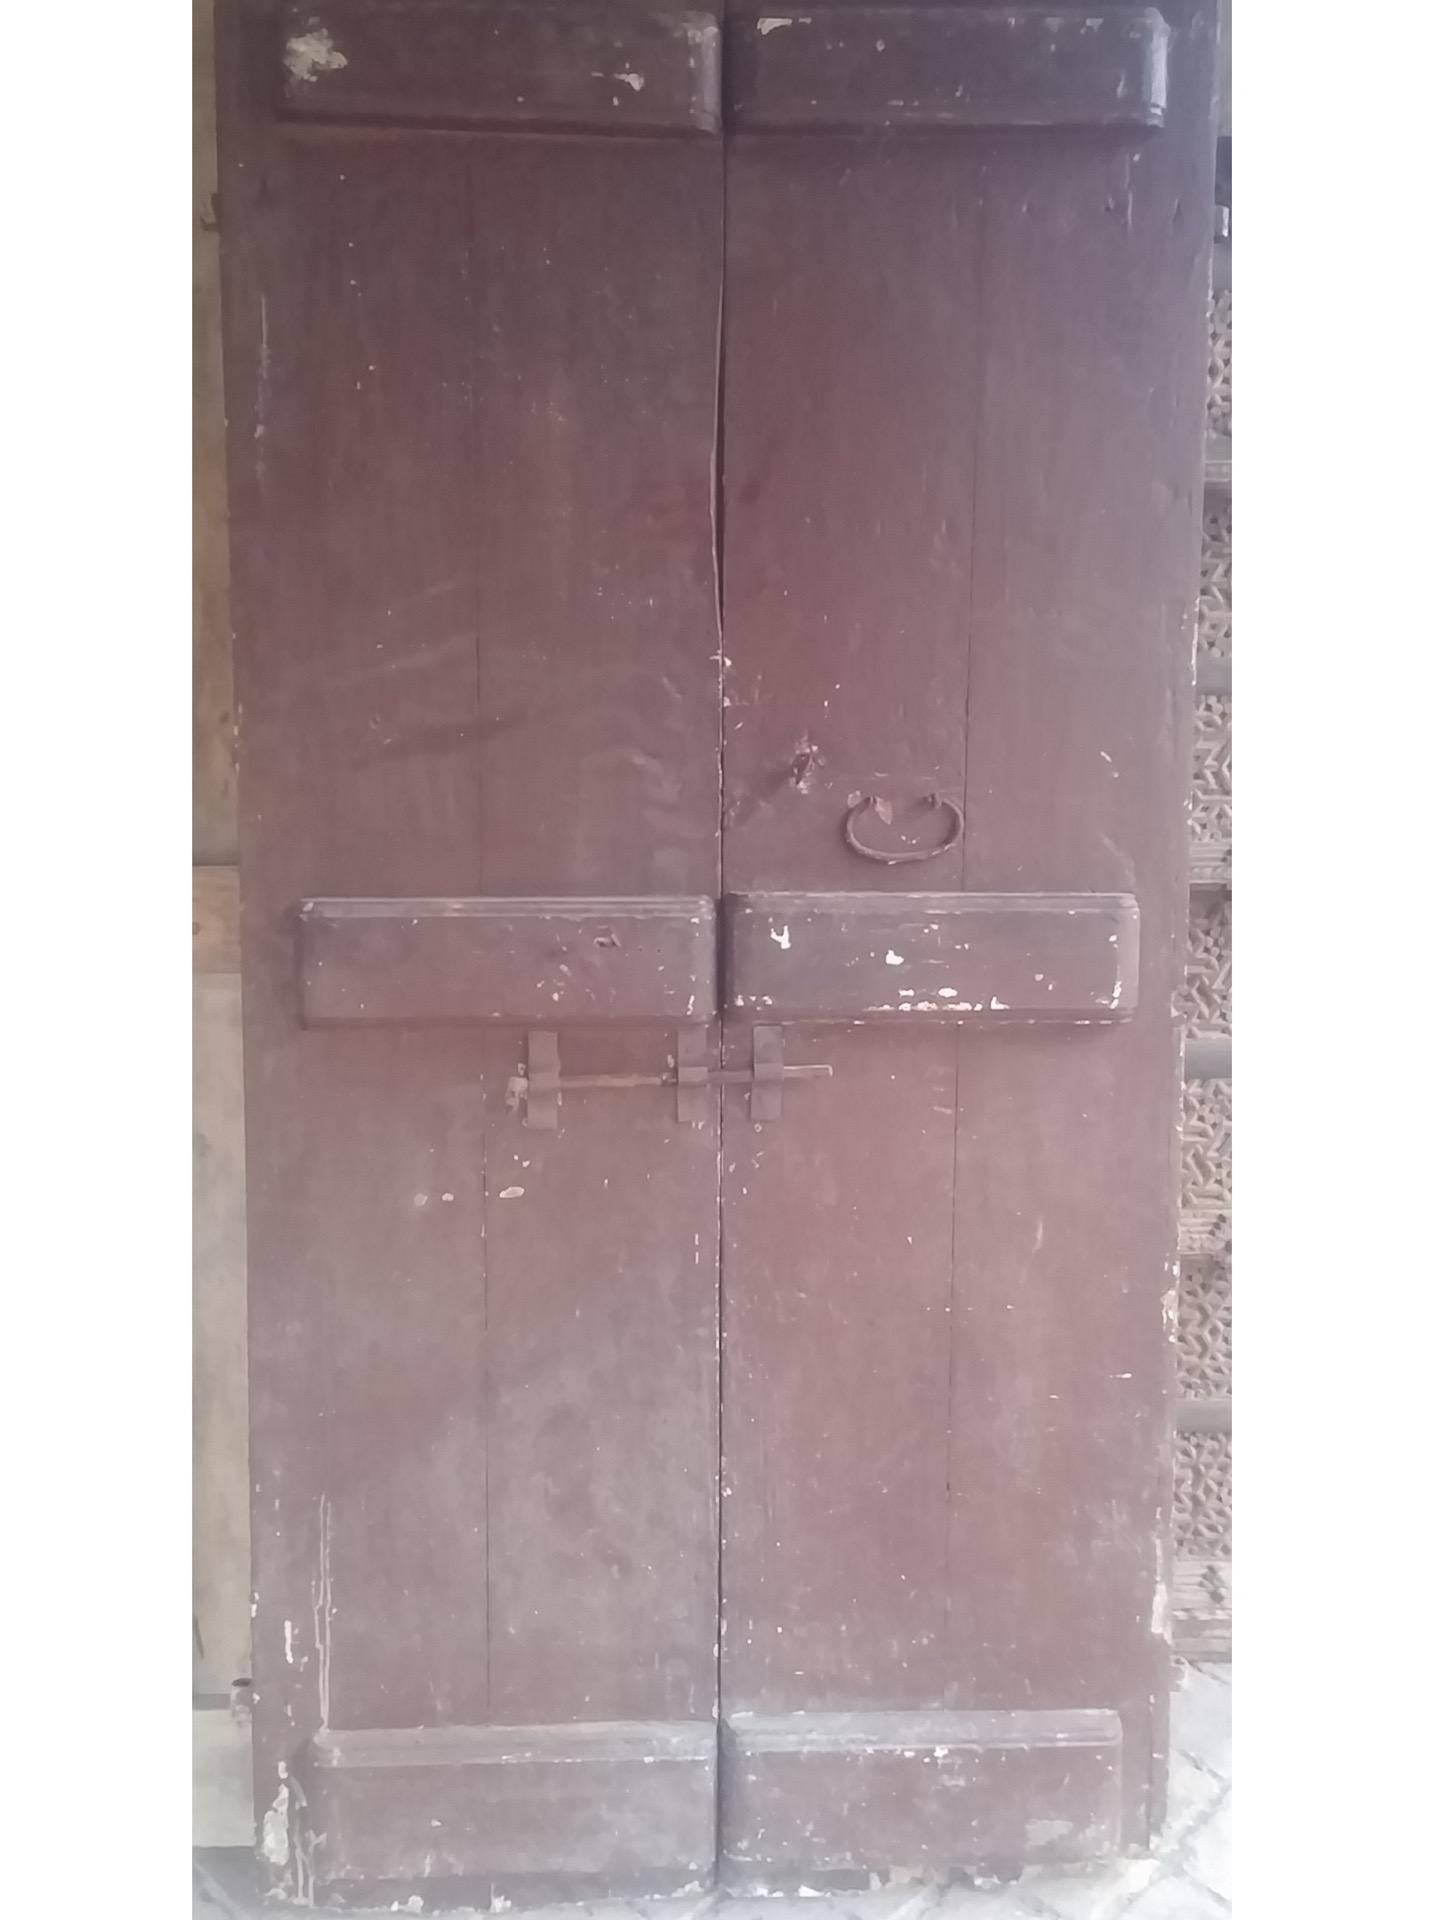 thumb2|porta a 2 ante